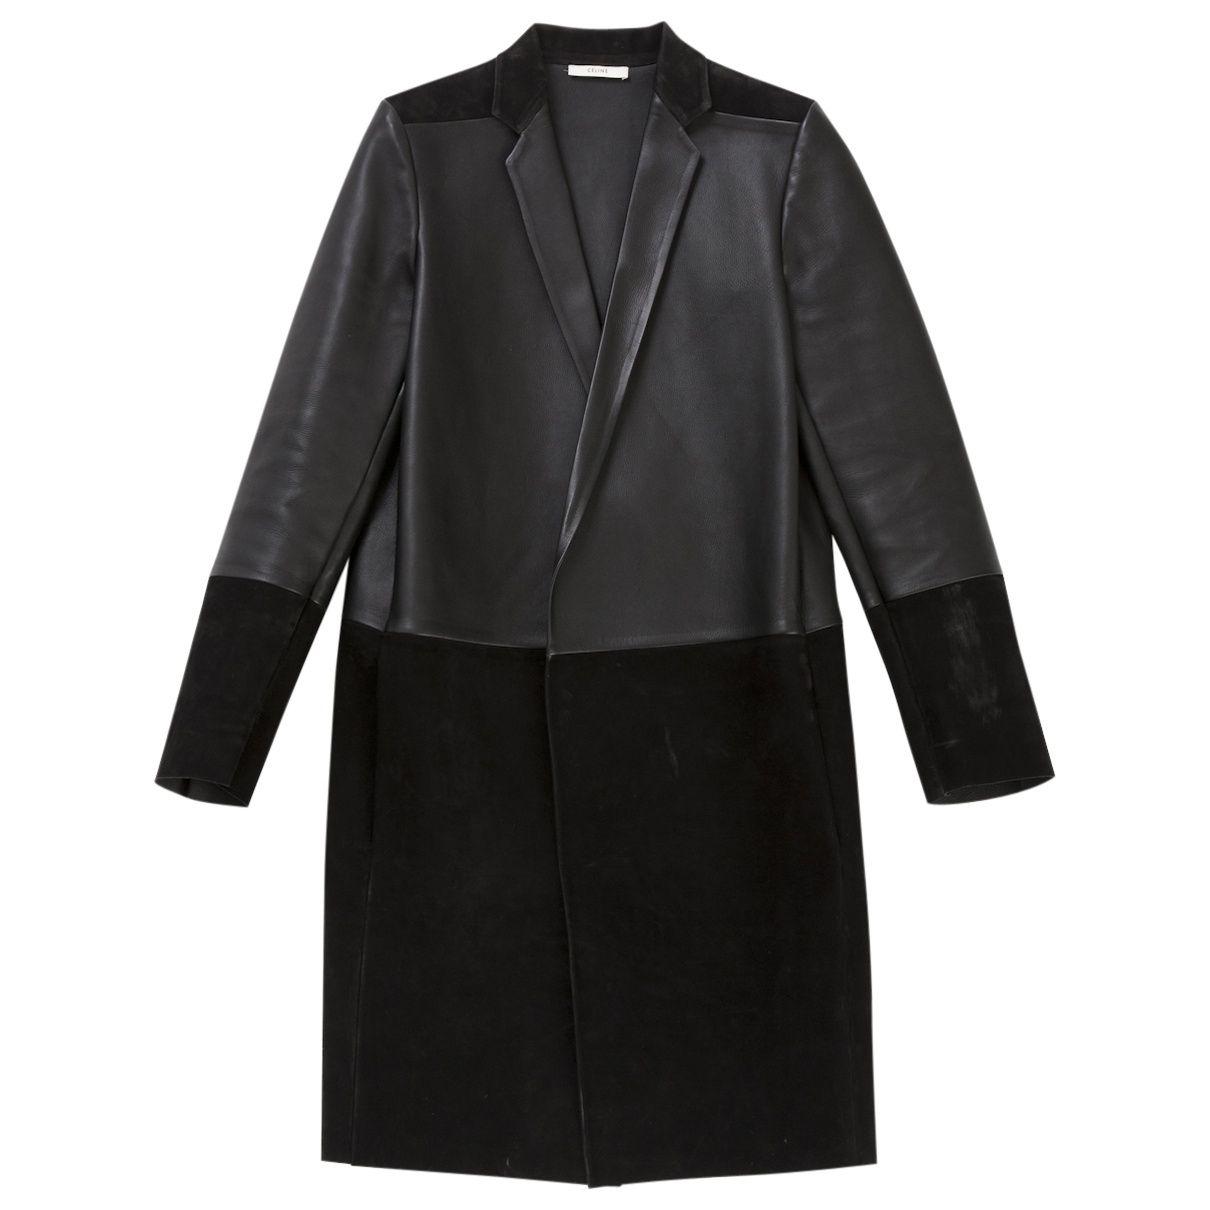 Celine Leather Bi-Materiel Coat   Vestiaire Collective